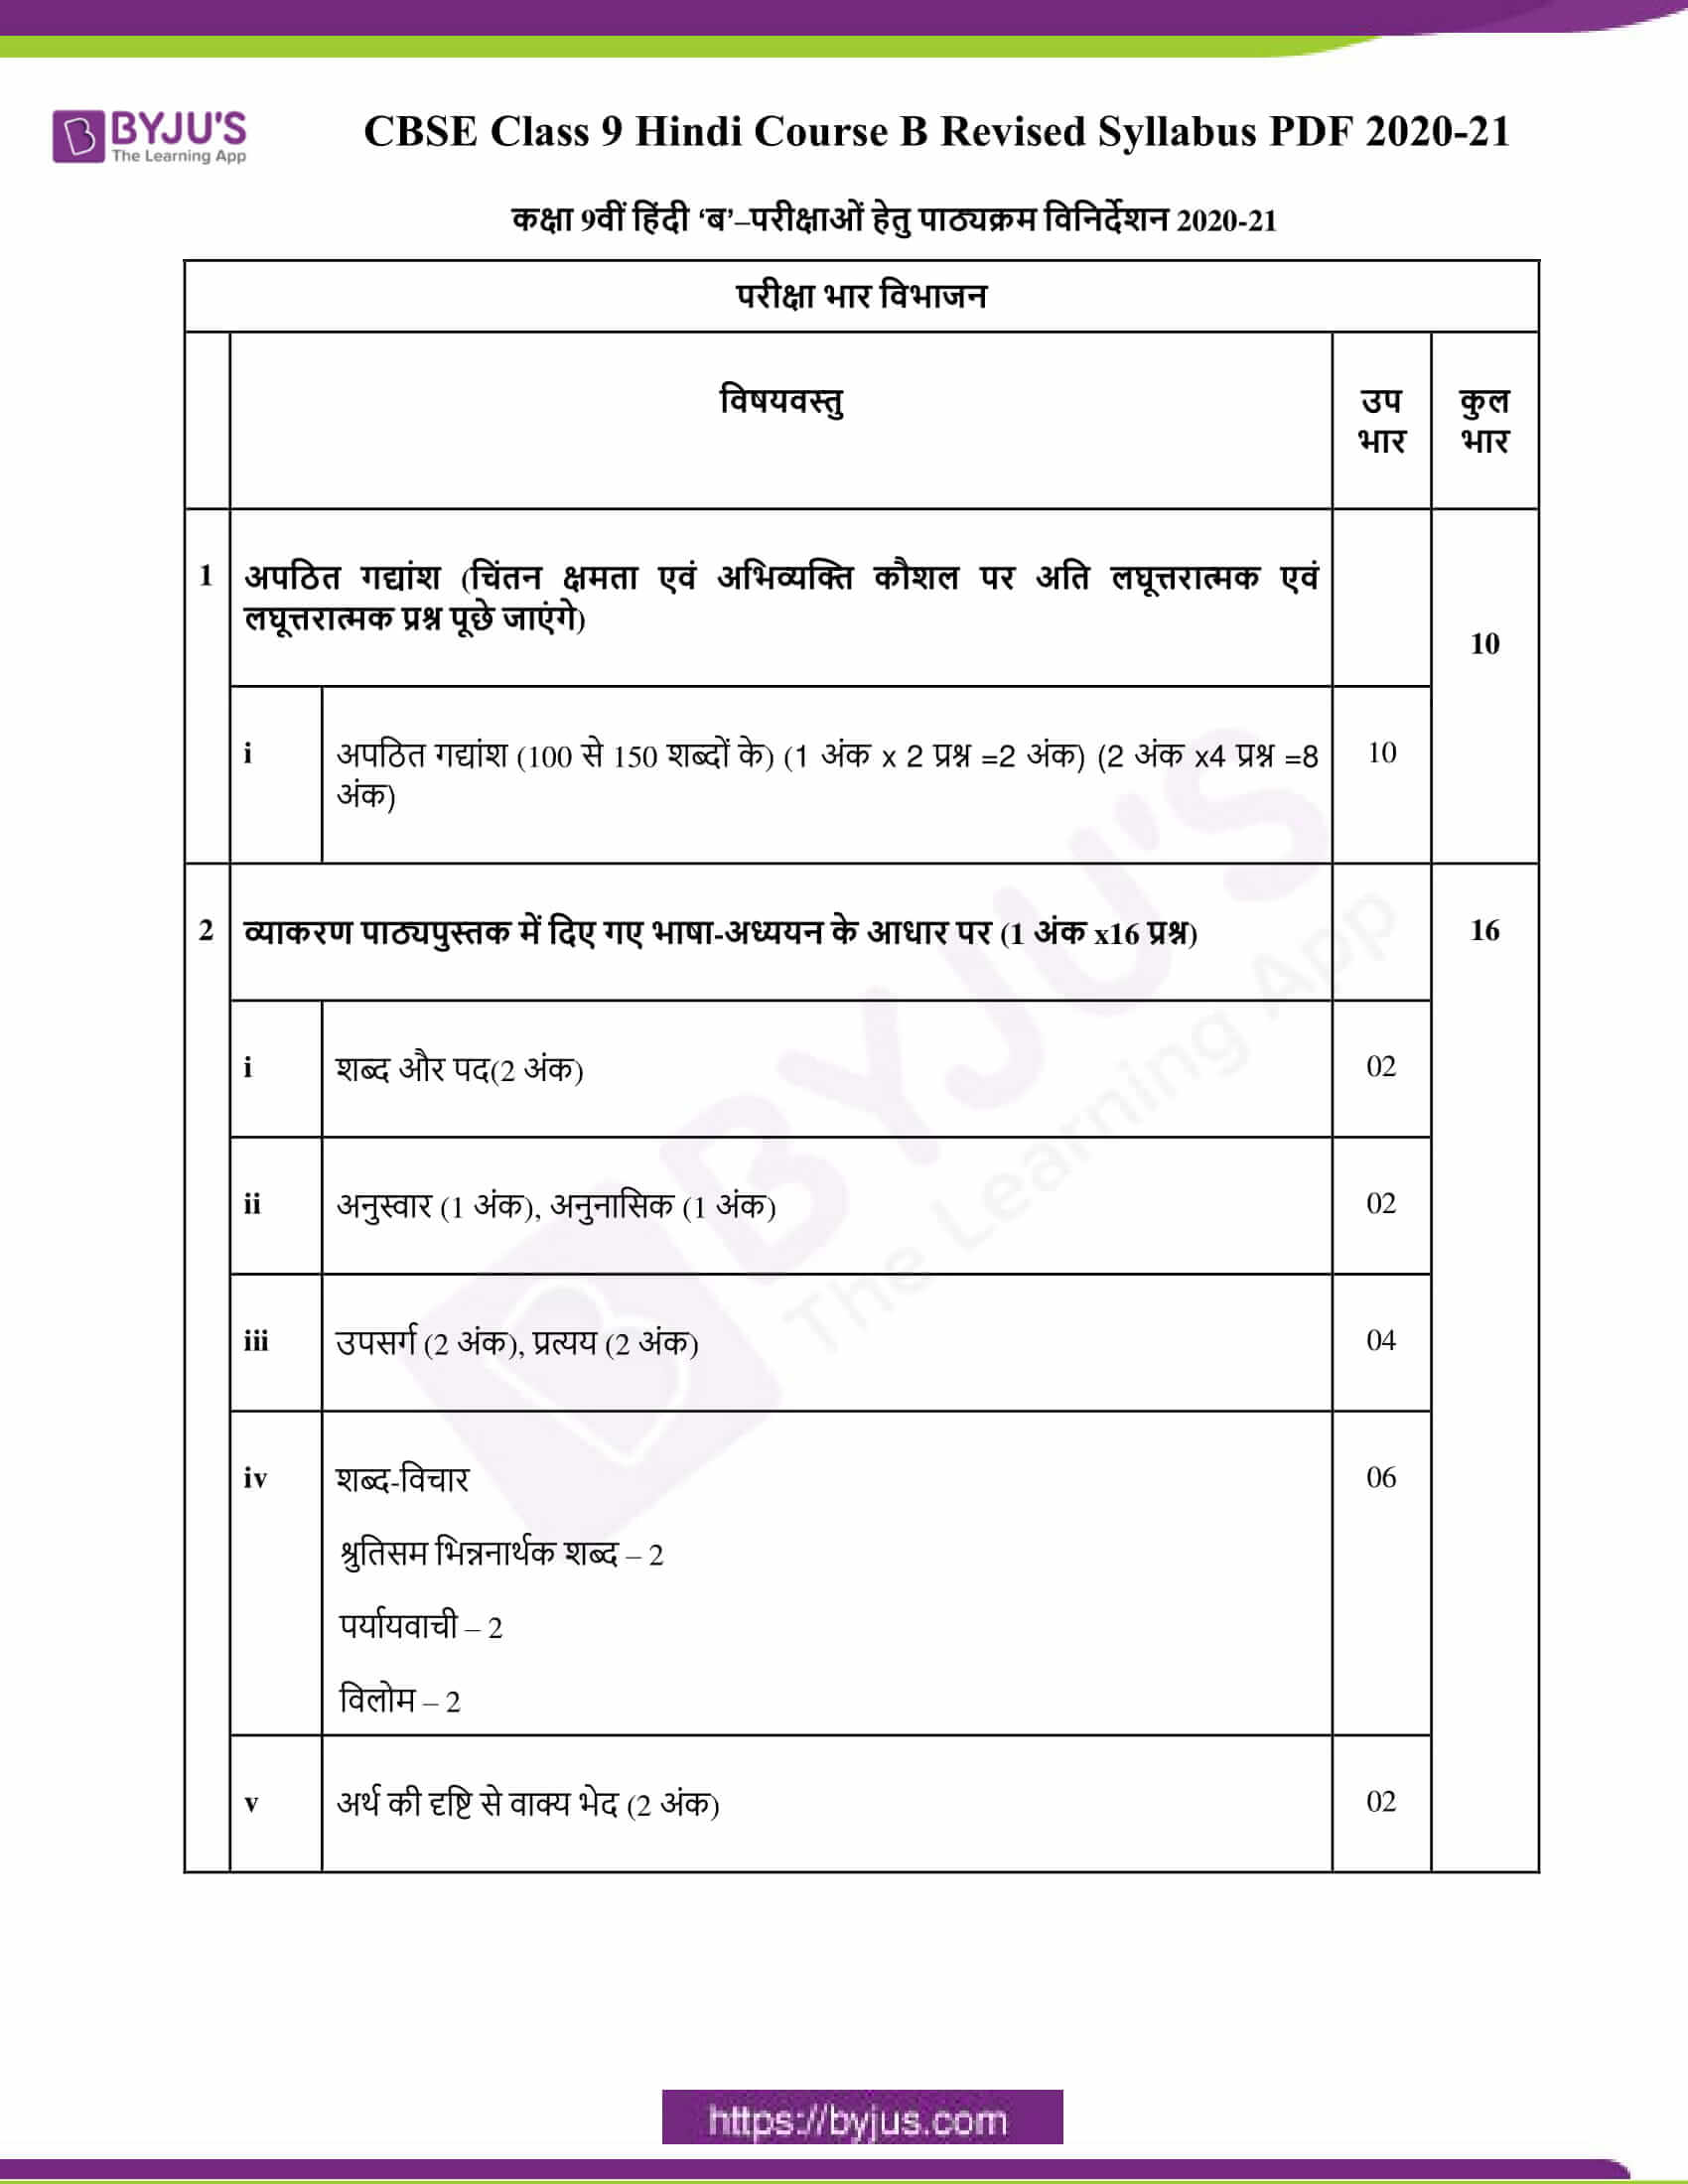 CBSE Class 9 Hindi Course B Revised Syllabus PDF 2020 21 1